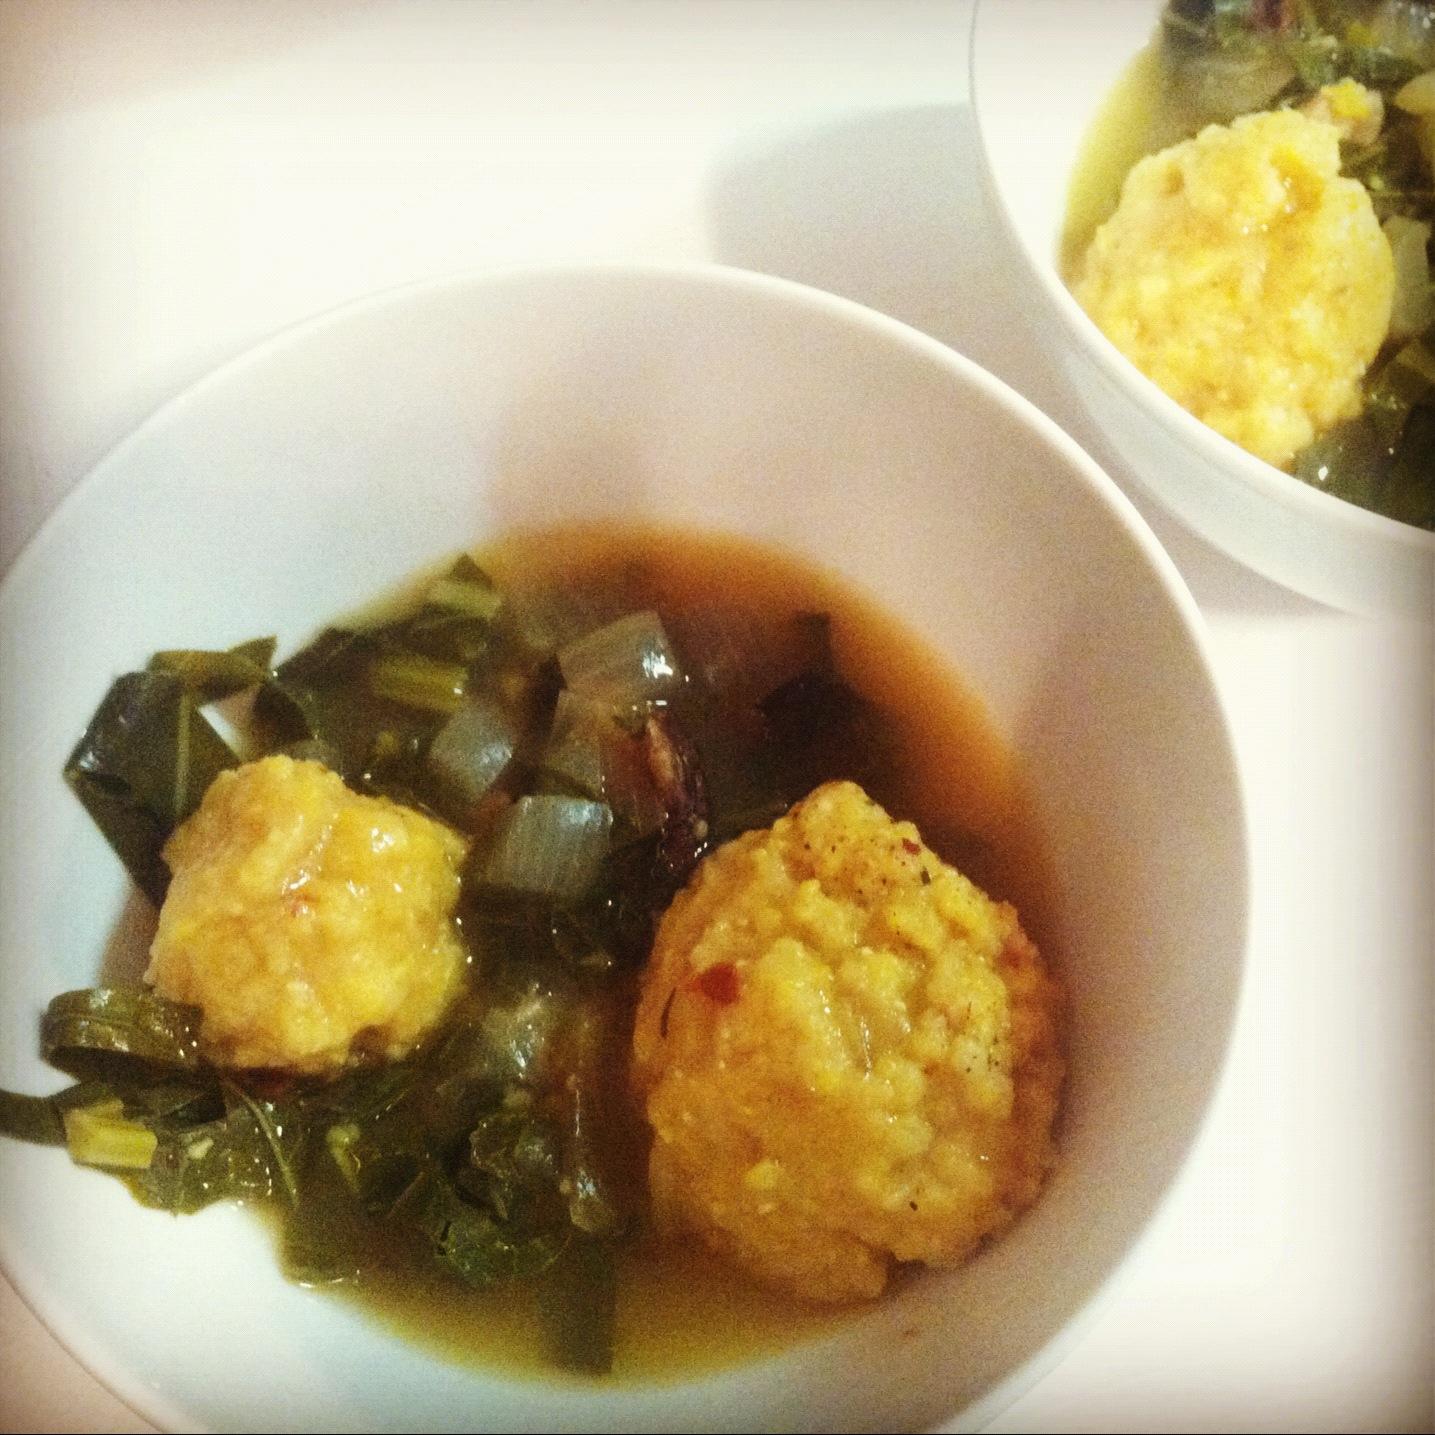 Farshicle: Simmered Collard Greens with Cornmeal Dumplings